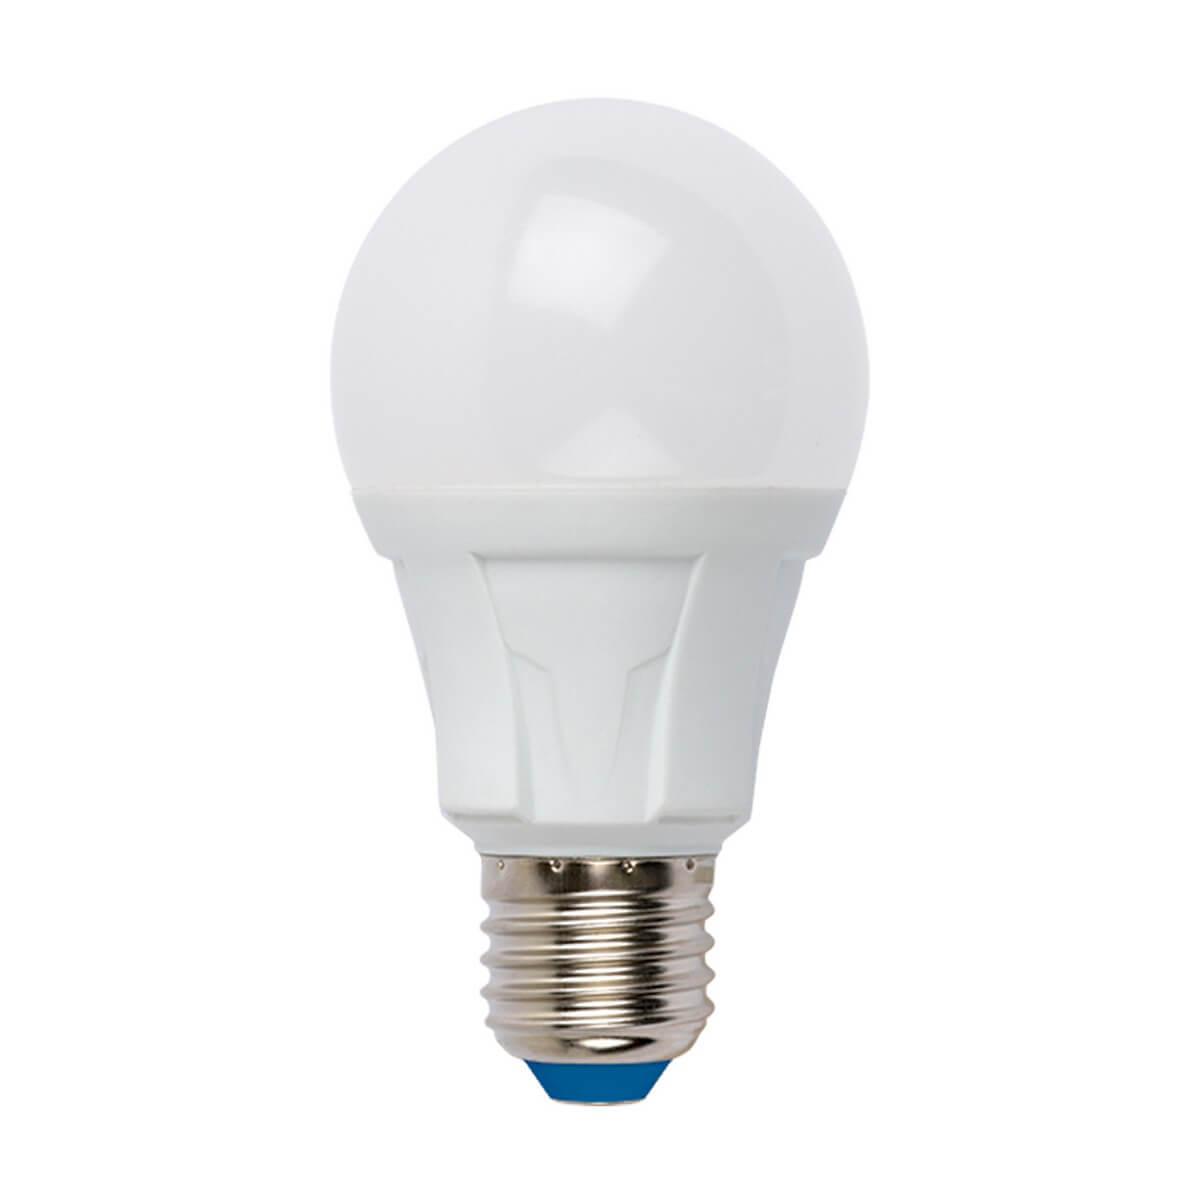 цена Лампочка Uniel LED-A60 12W/6500K/E27/FR/DIM PLP01WH Яркая (Диммирование) онлайн в 2017 году